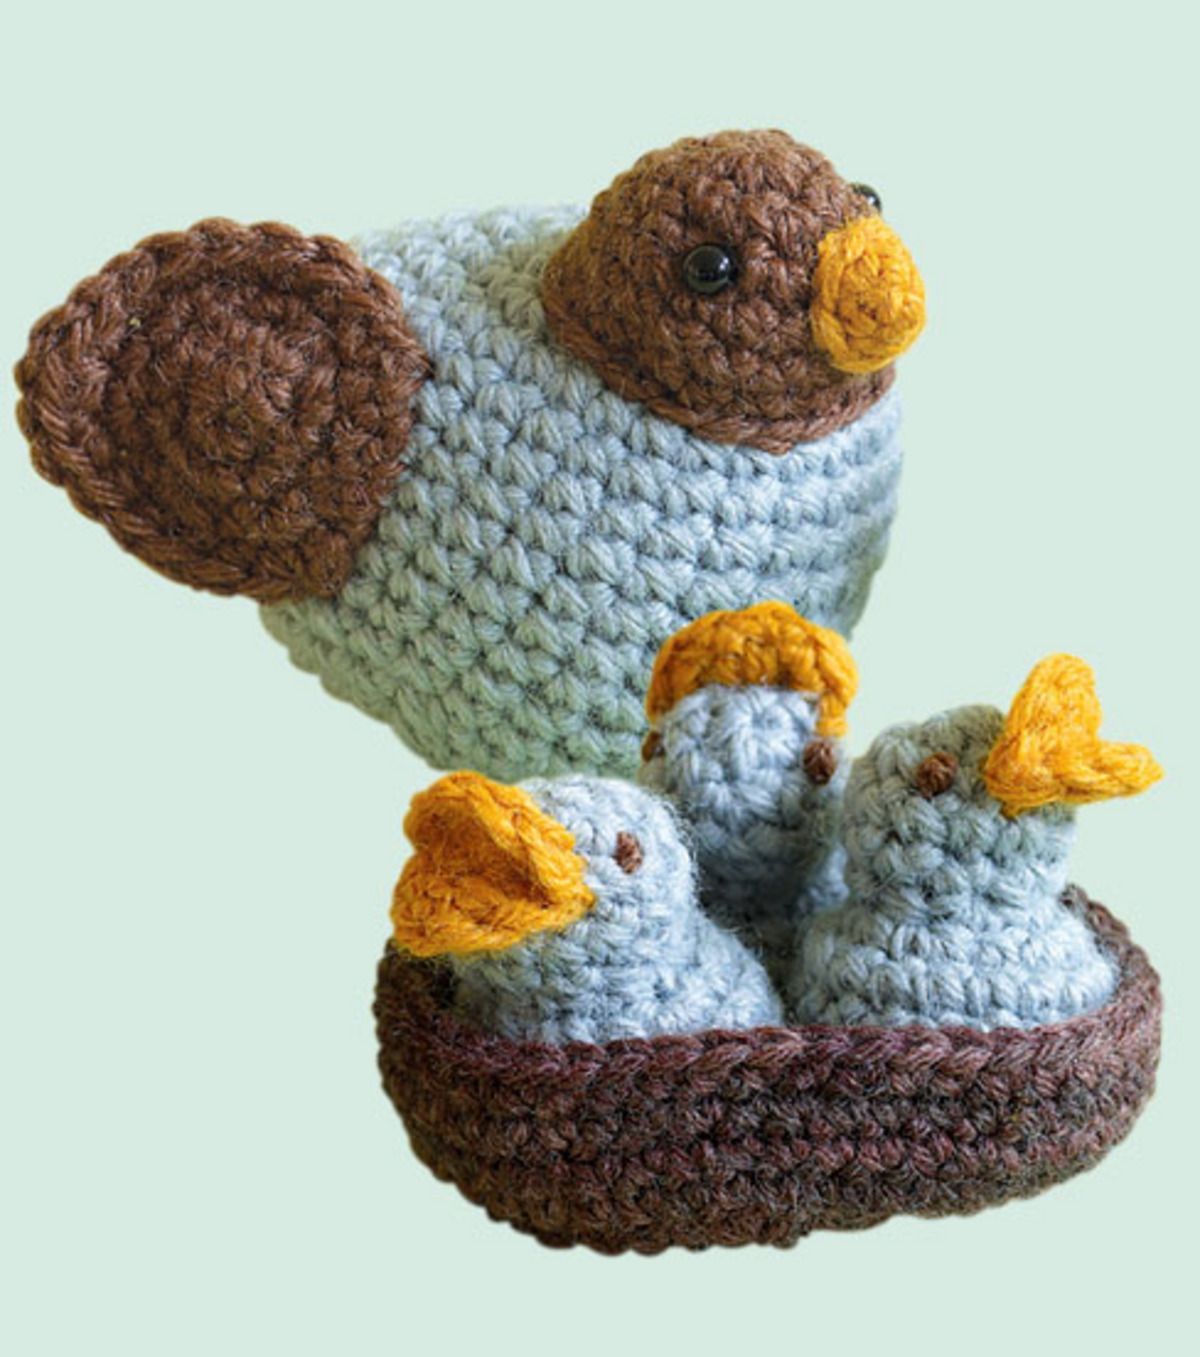 Adorable crocheted amigurumi baby birds in a nest! | Crochet with ...